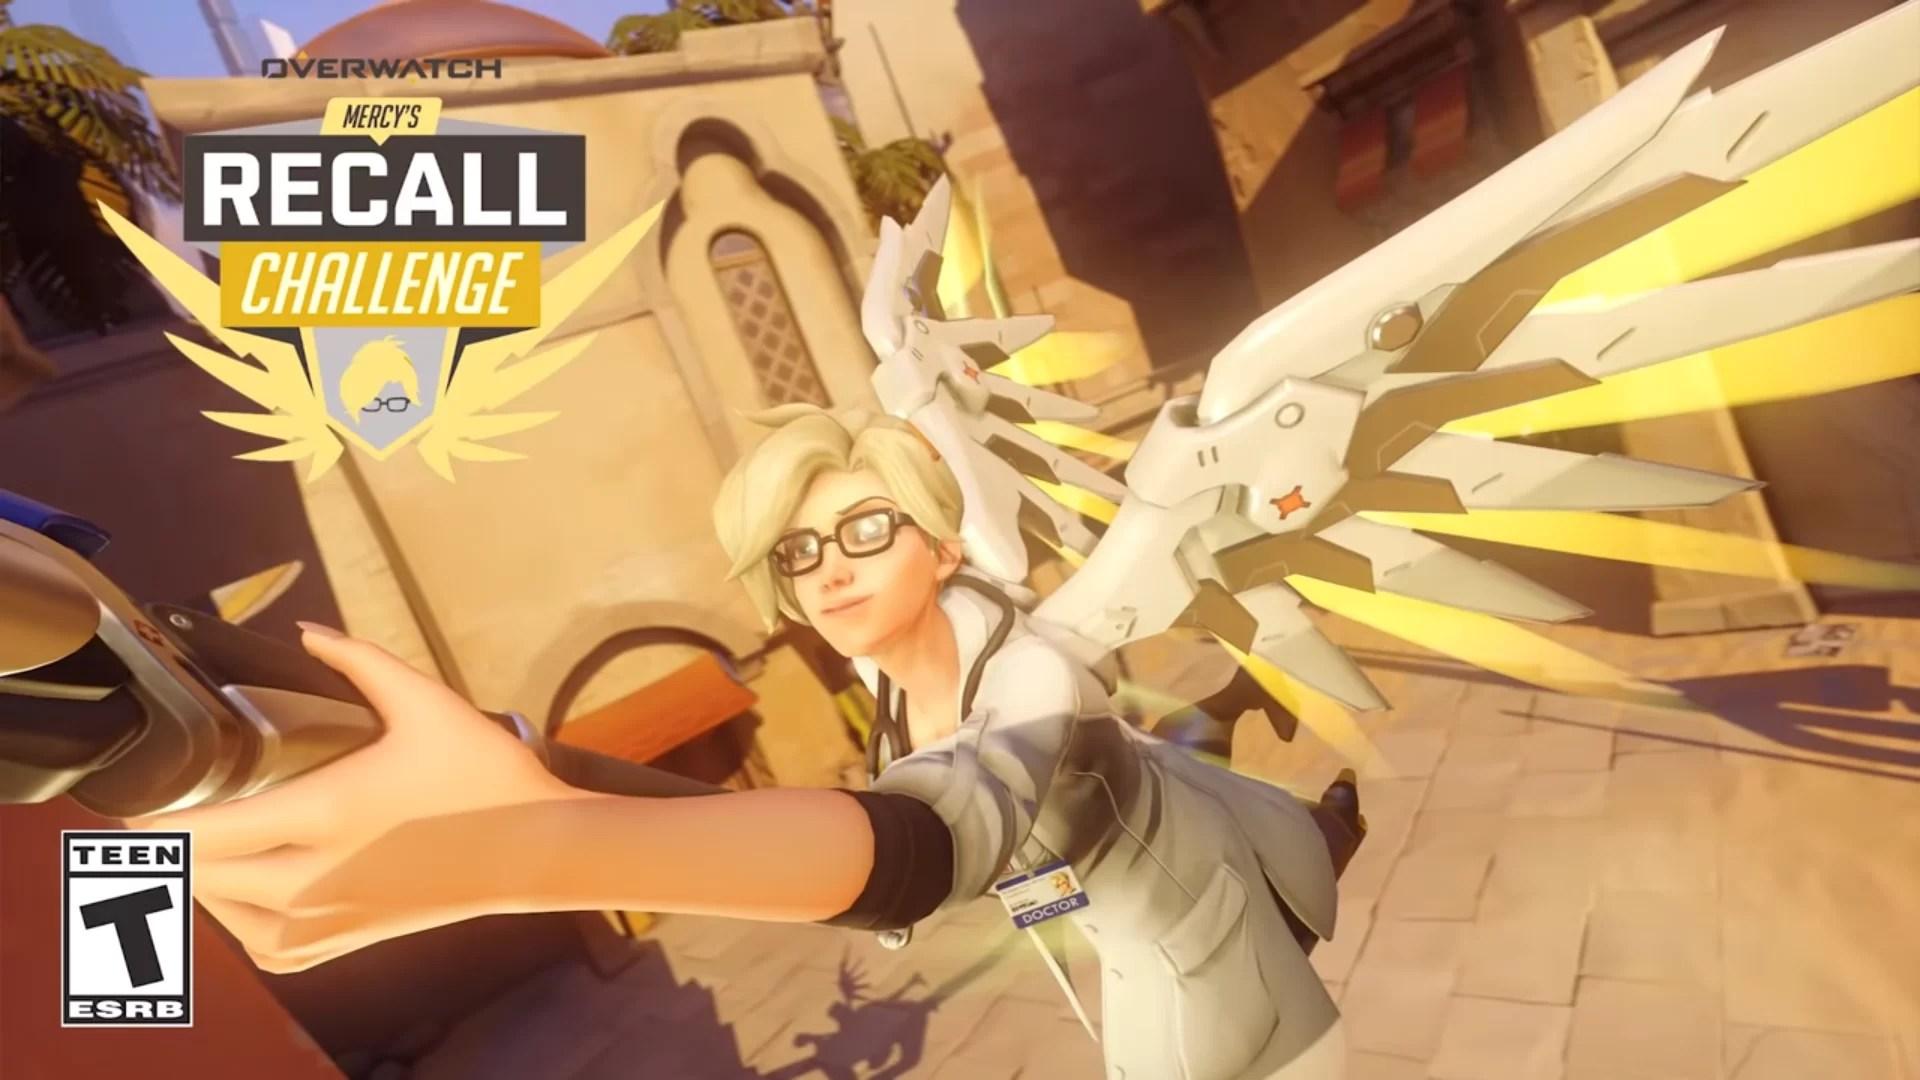 Overwatch : Mercy's Recall event